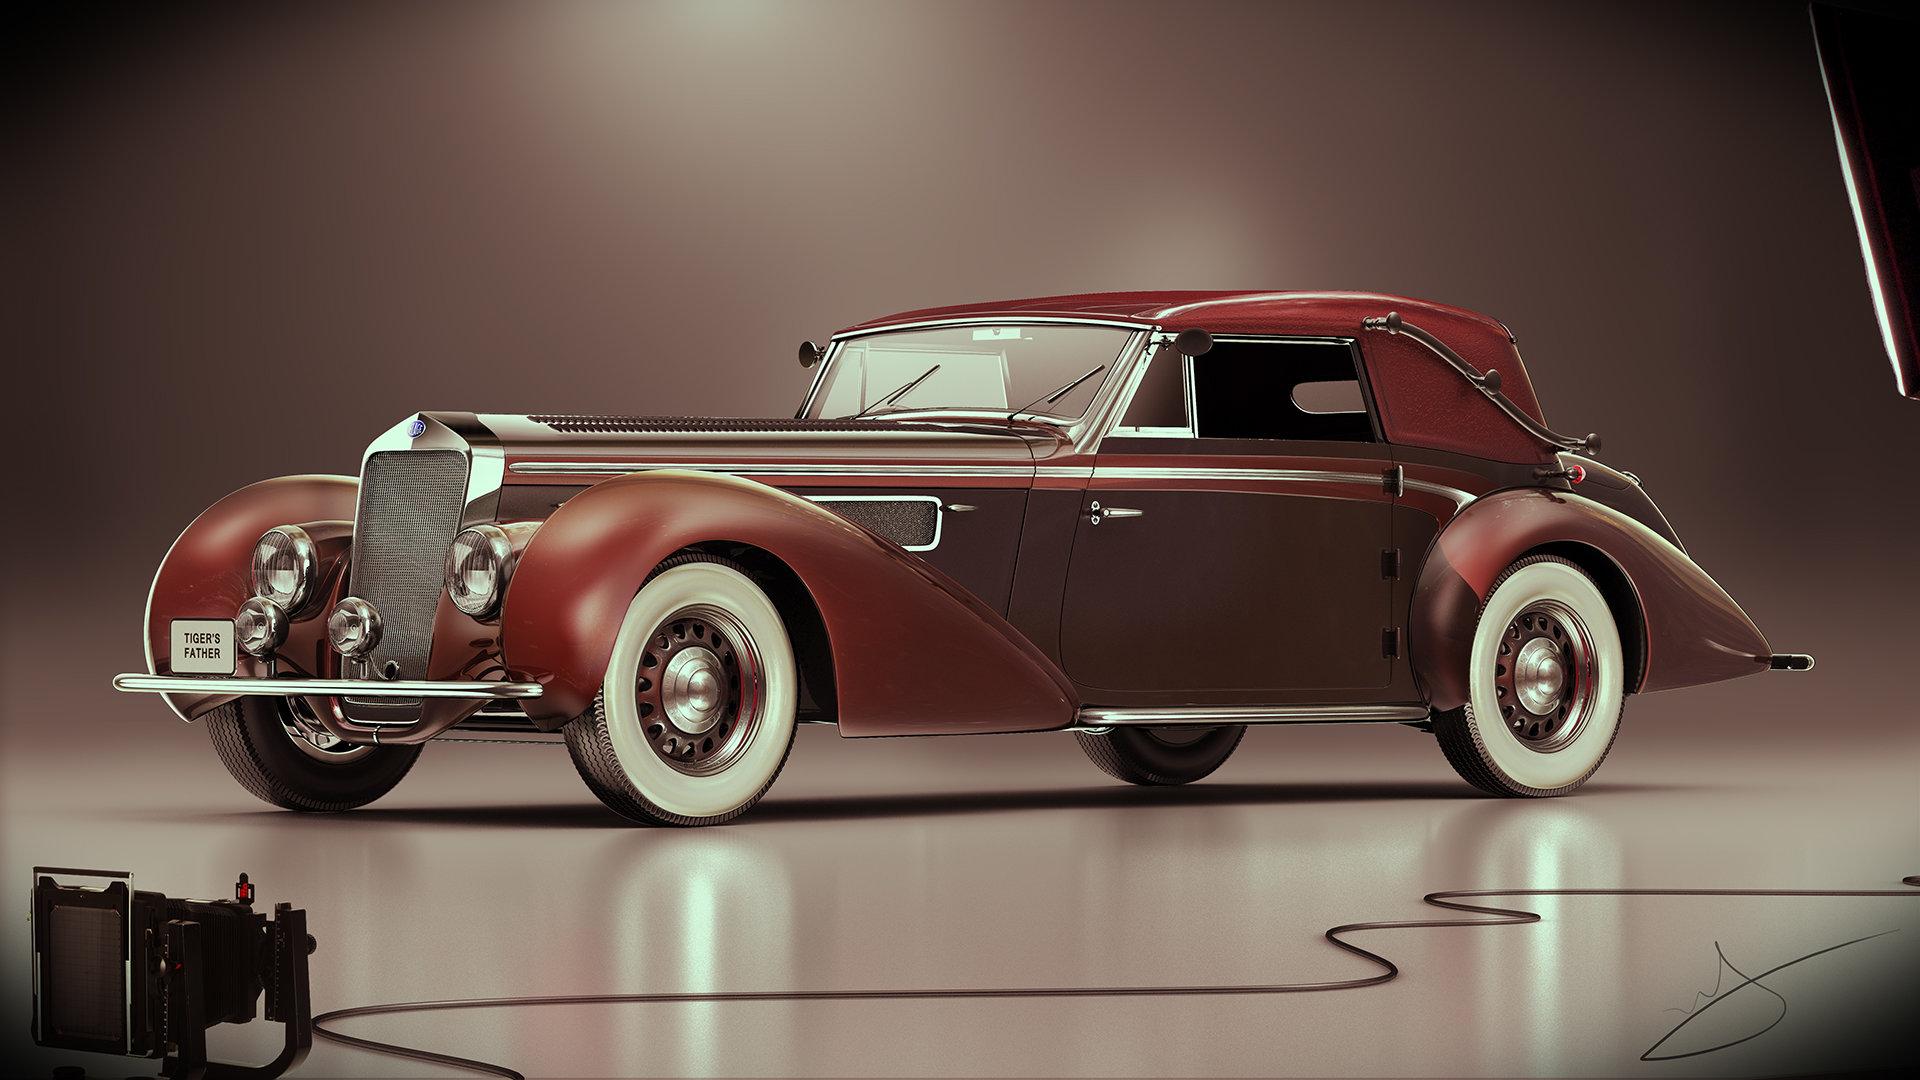 Alexandr novitskiy 1939 delage d8 120 cabriolet chapron 01